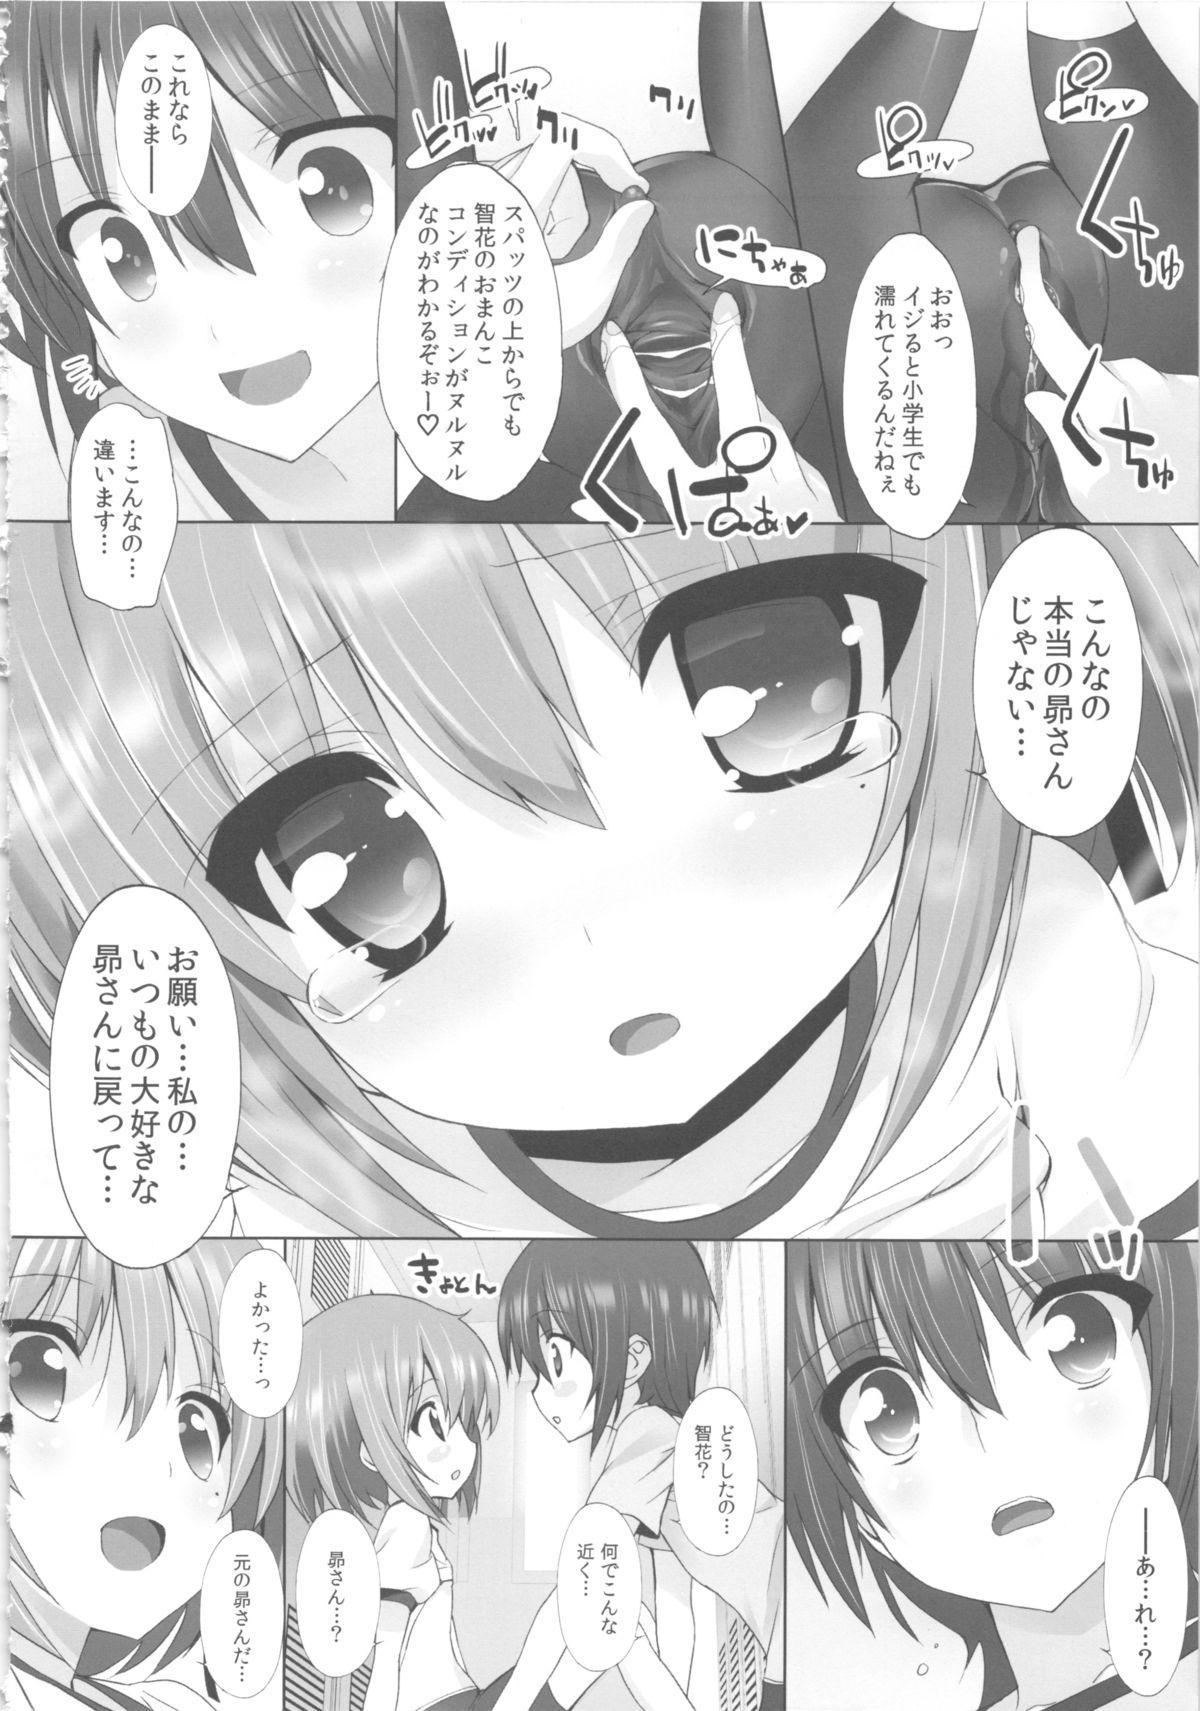 THE Under Chuugakusei 2 13